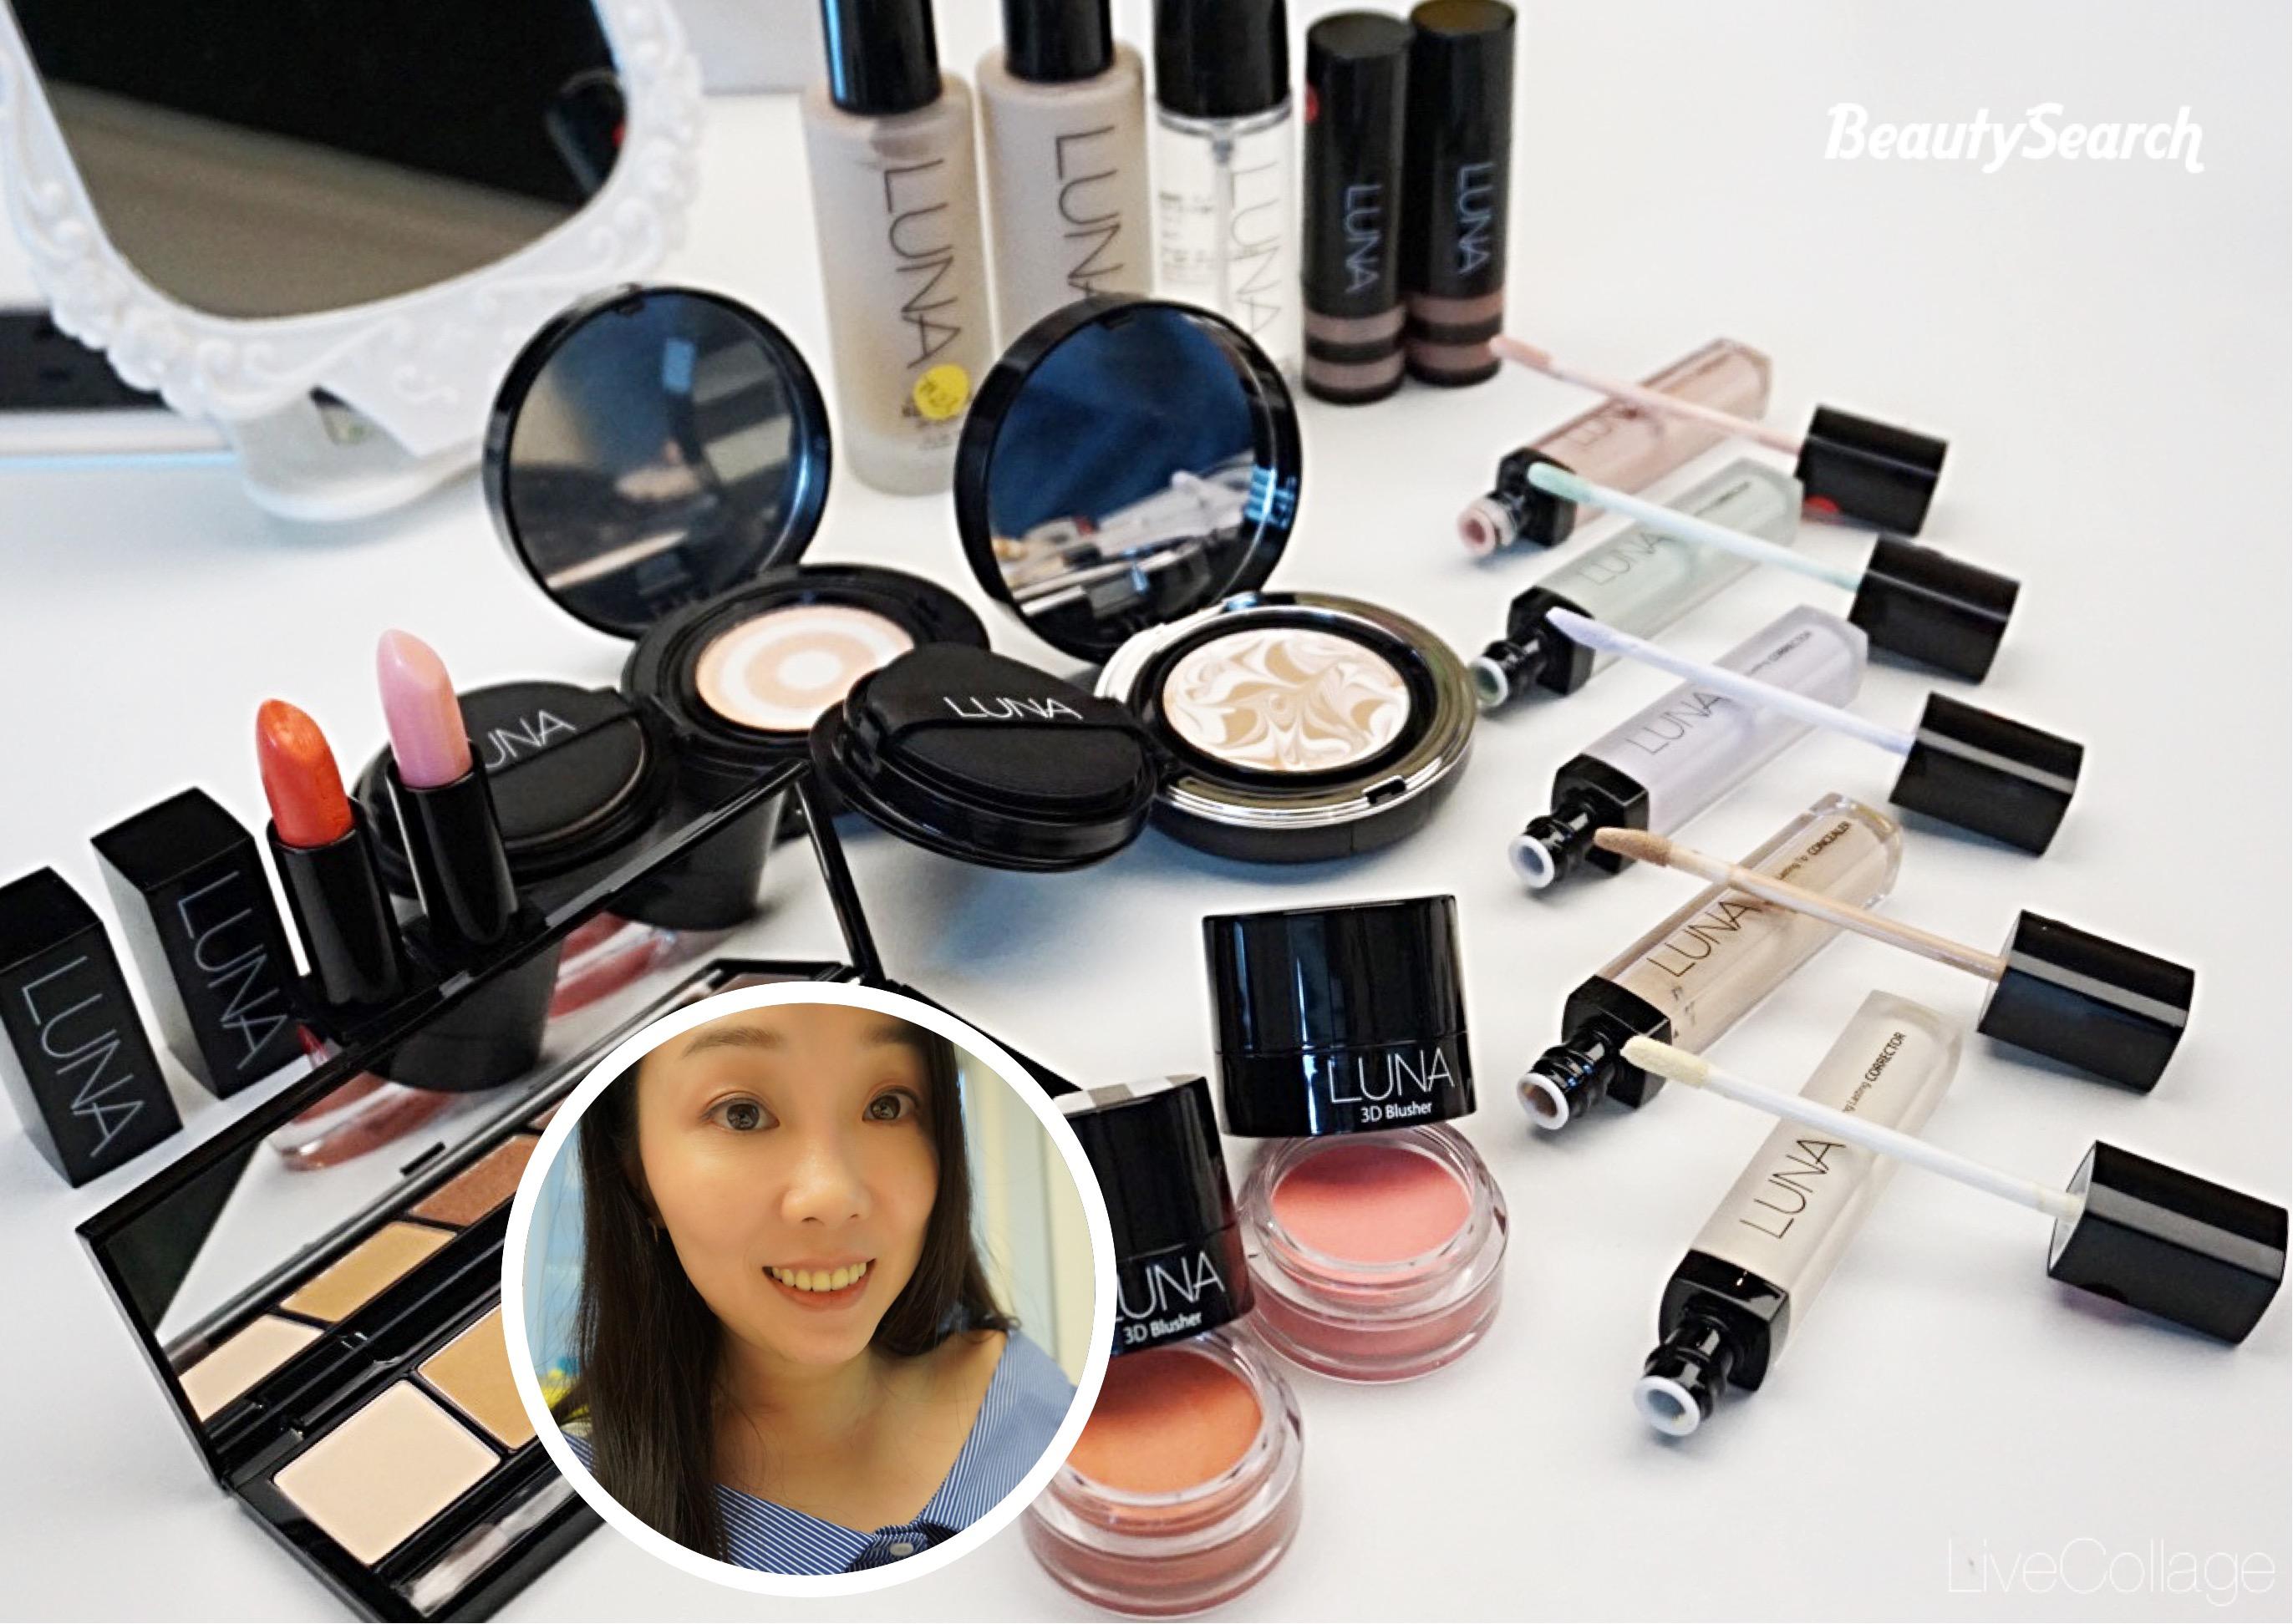 【EVENT】LUNA美妝工作坊 ・.✩゚打造秋冬水潤妝容